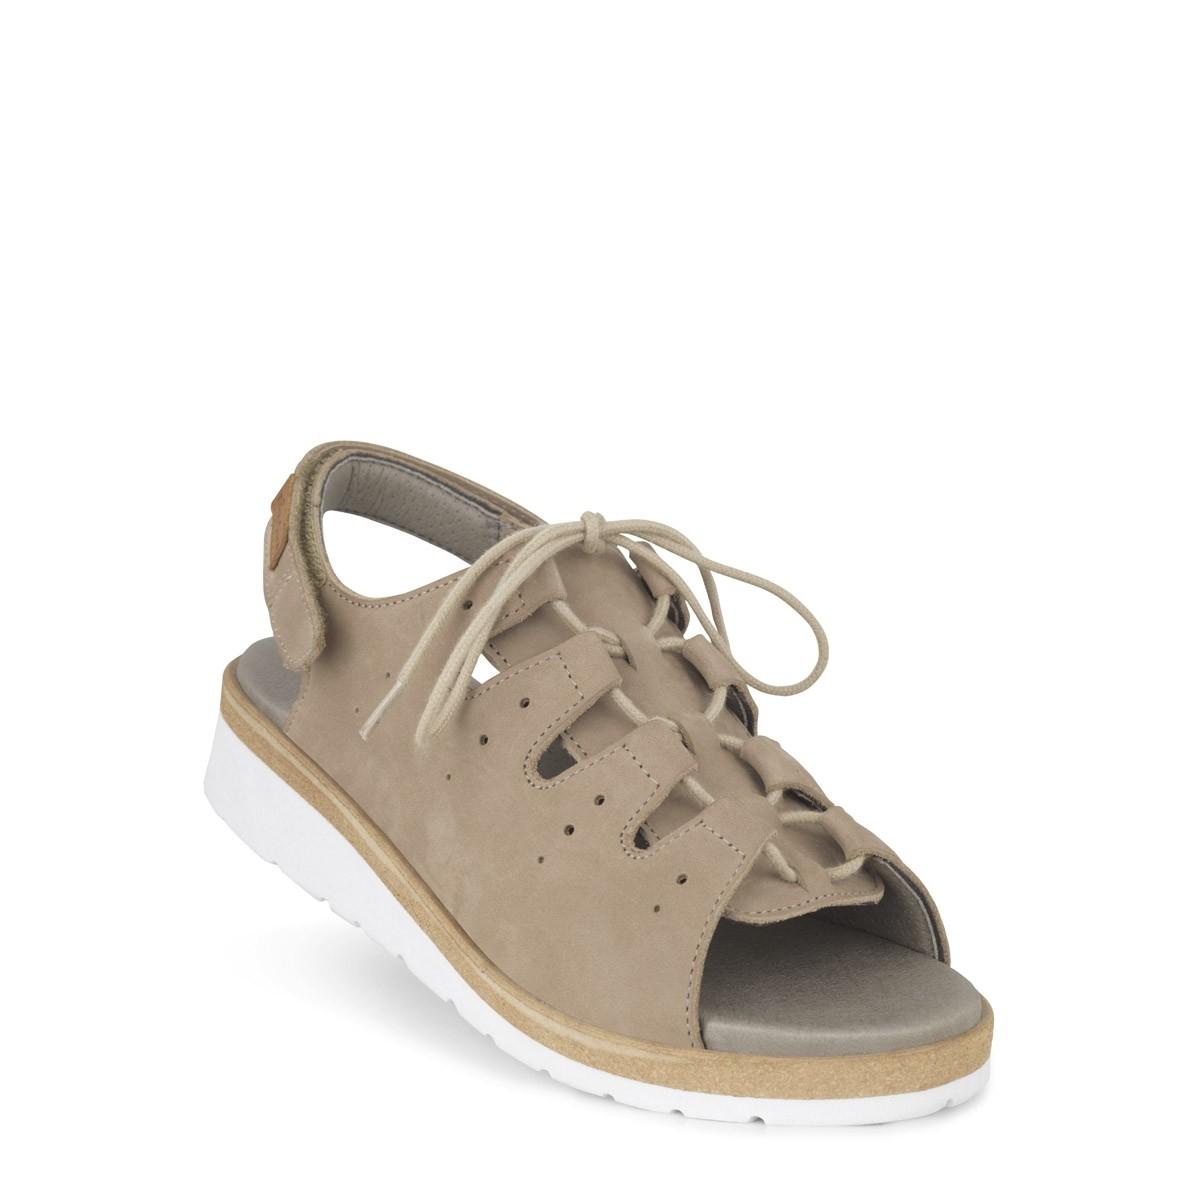 603385c0a2b3 Forside   Special mærker   New Feet   New Feet Dame